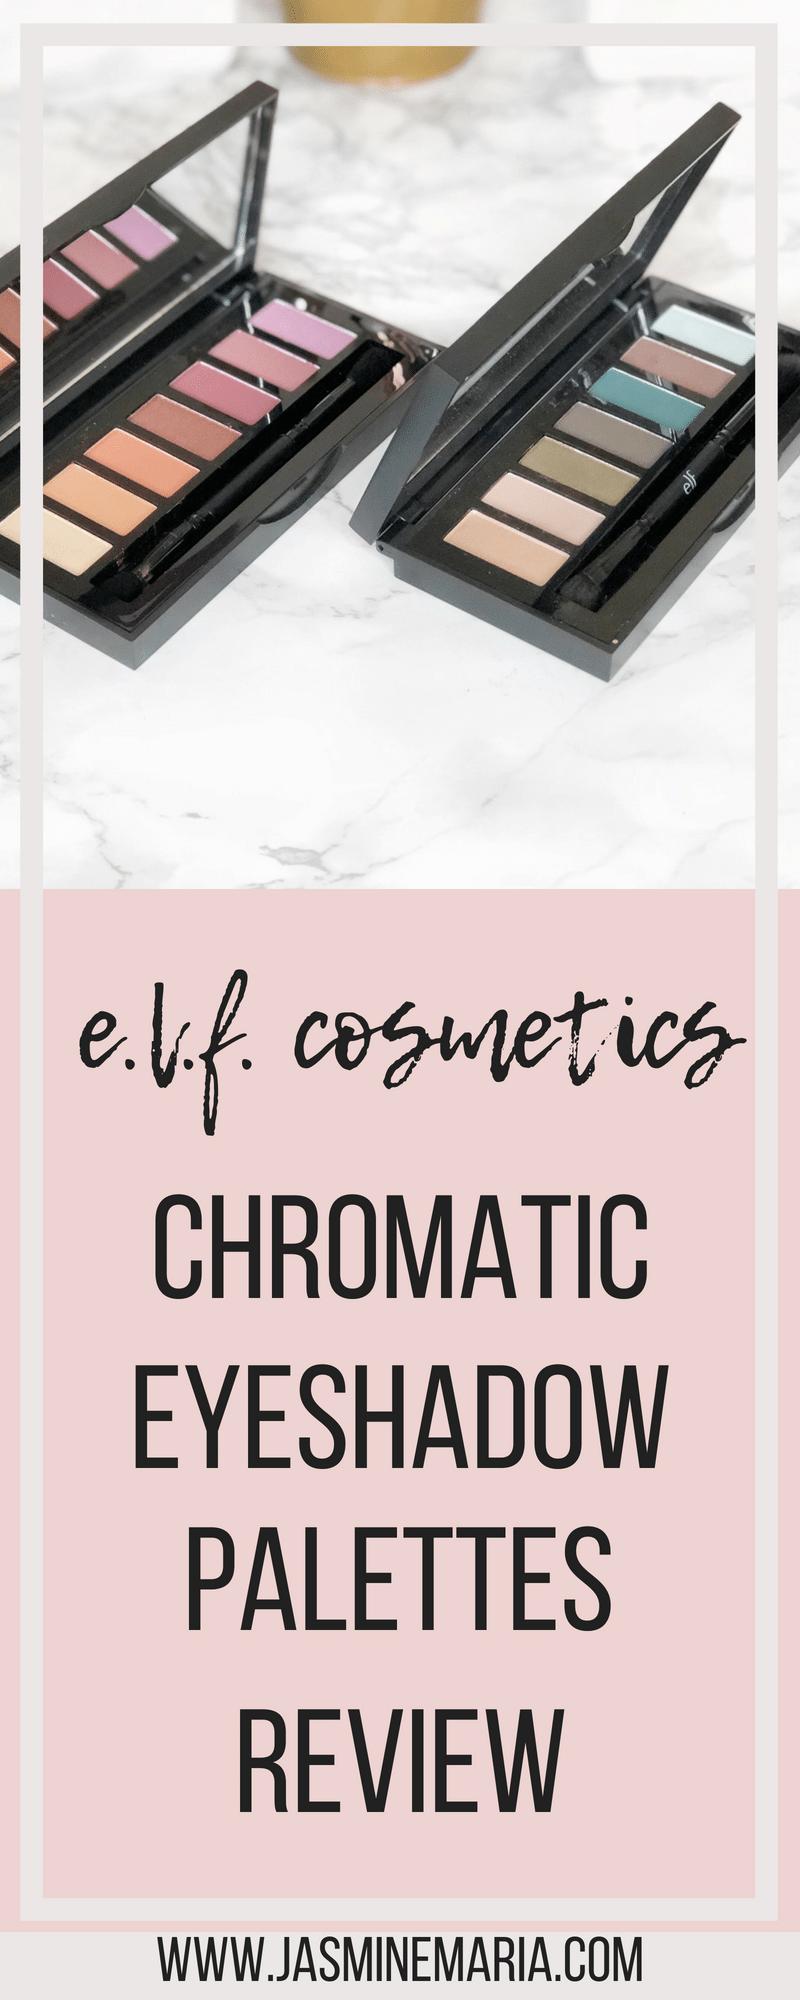 e.l.f cosmetics Chromatic Eyeshadow Palettes